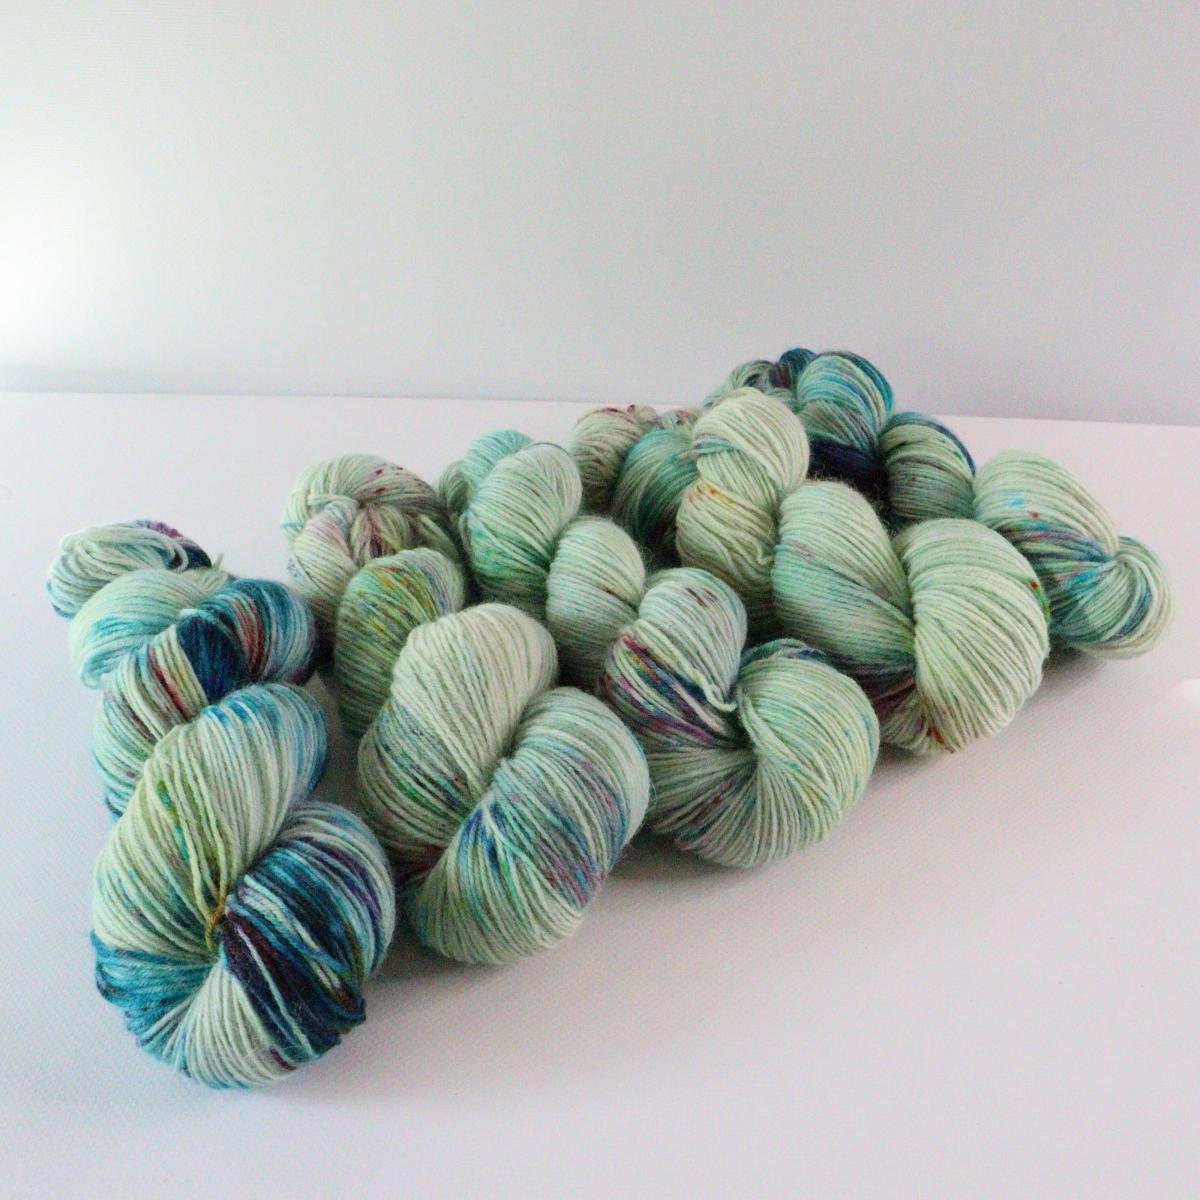 woodico.pro hand dyed yarn 072 4 1200x1200 - Hand dyed yarn / 072